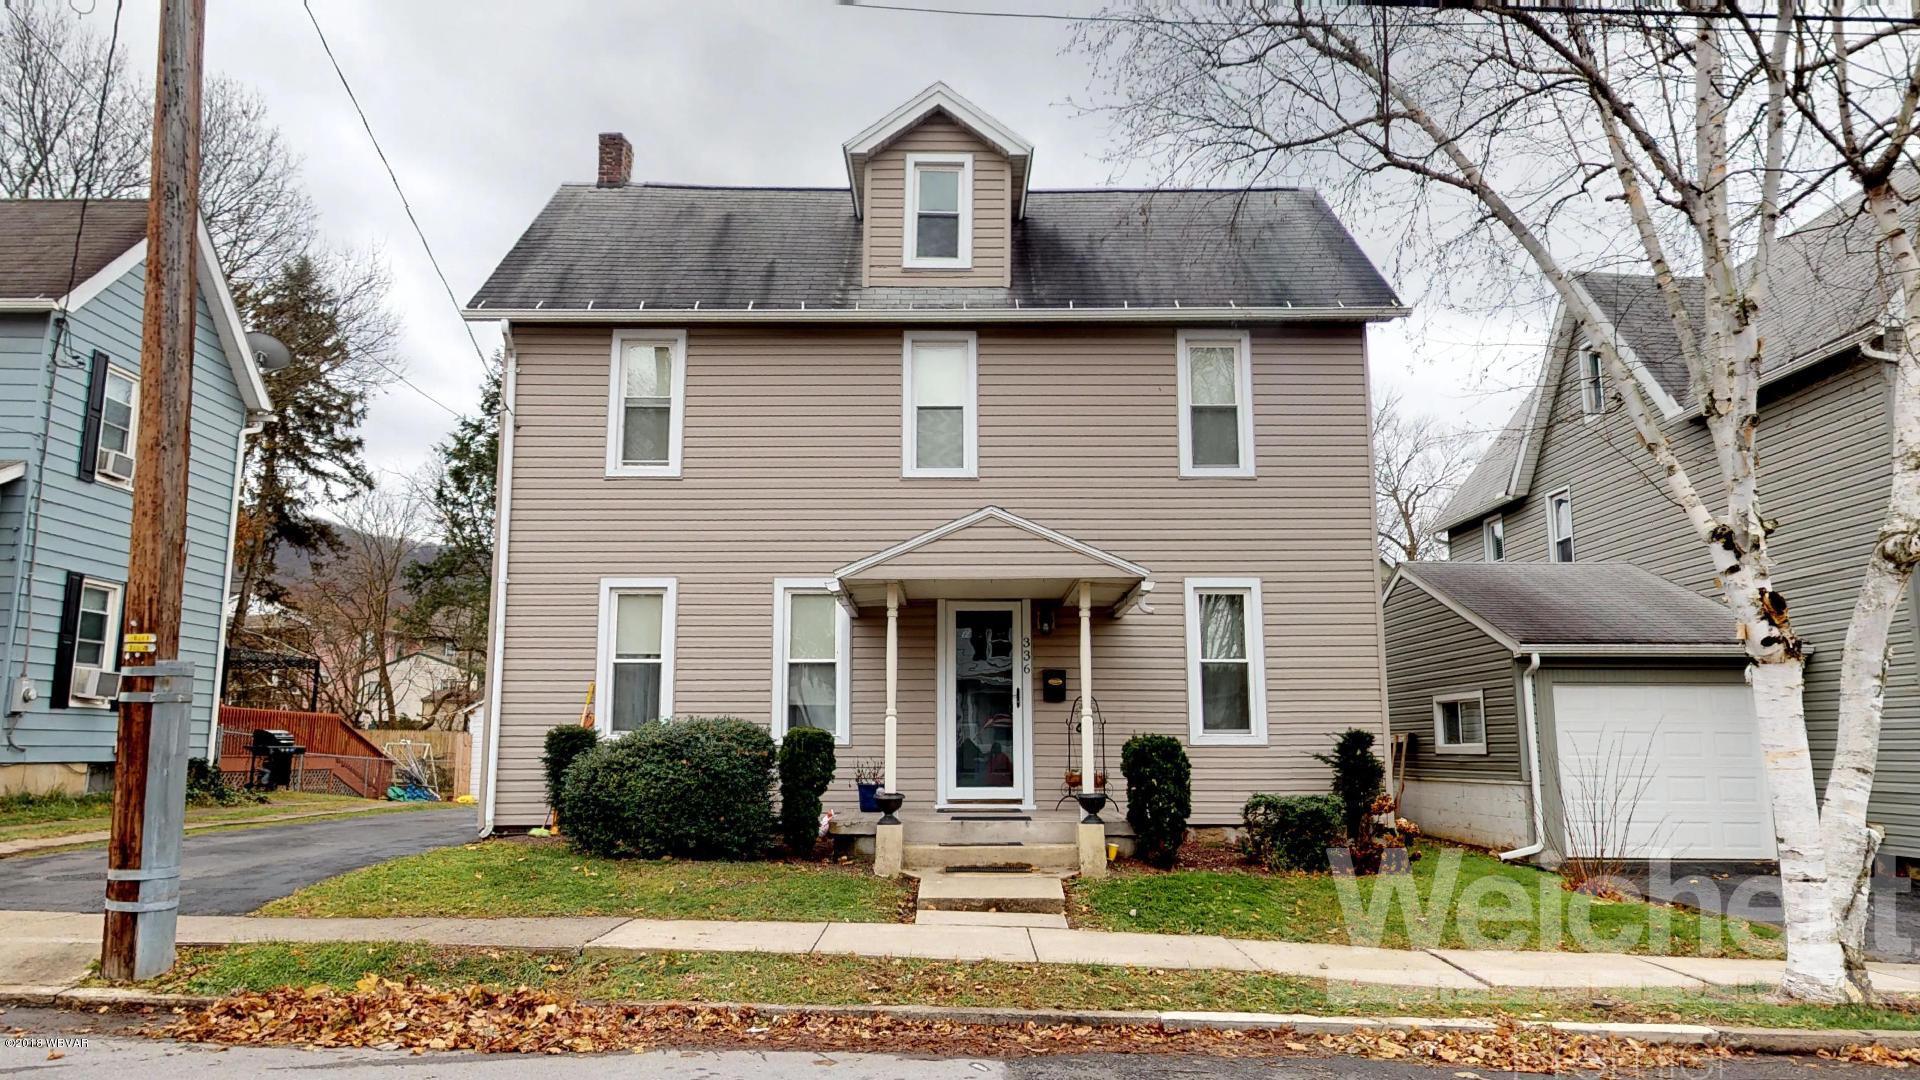 336 MAIN STREET,S. Williamsport,PA 17702,4 Bedrooms Bedrooms,2 BathroomsBathrooms,Residential,MAIN,WB-86019